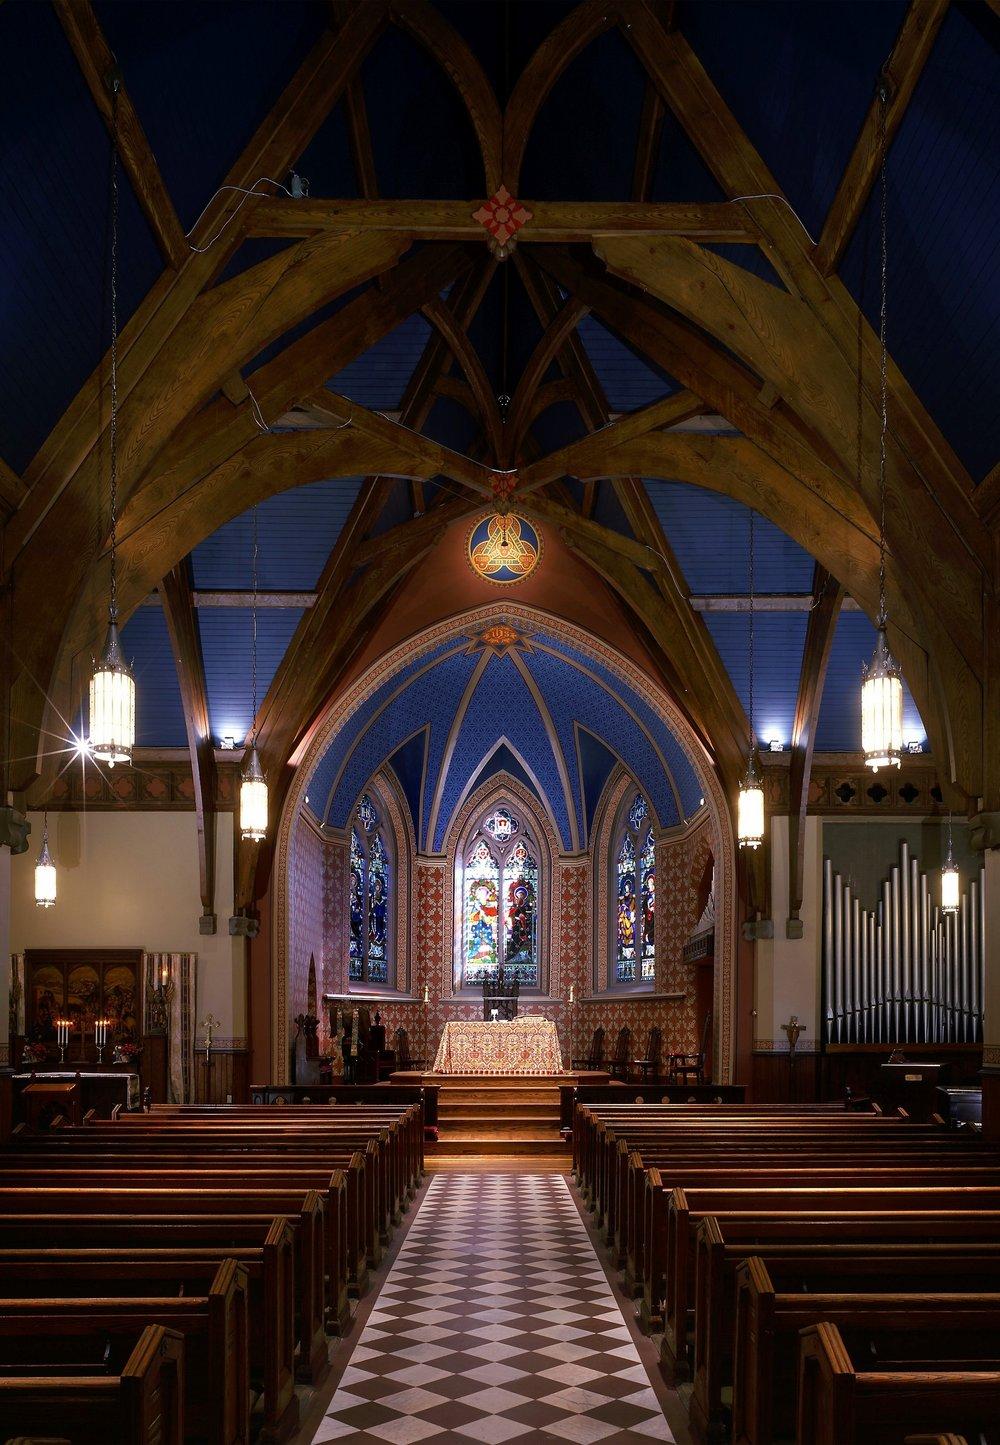 canning-christ-church-riverdale-beams.jpg